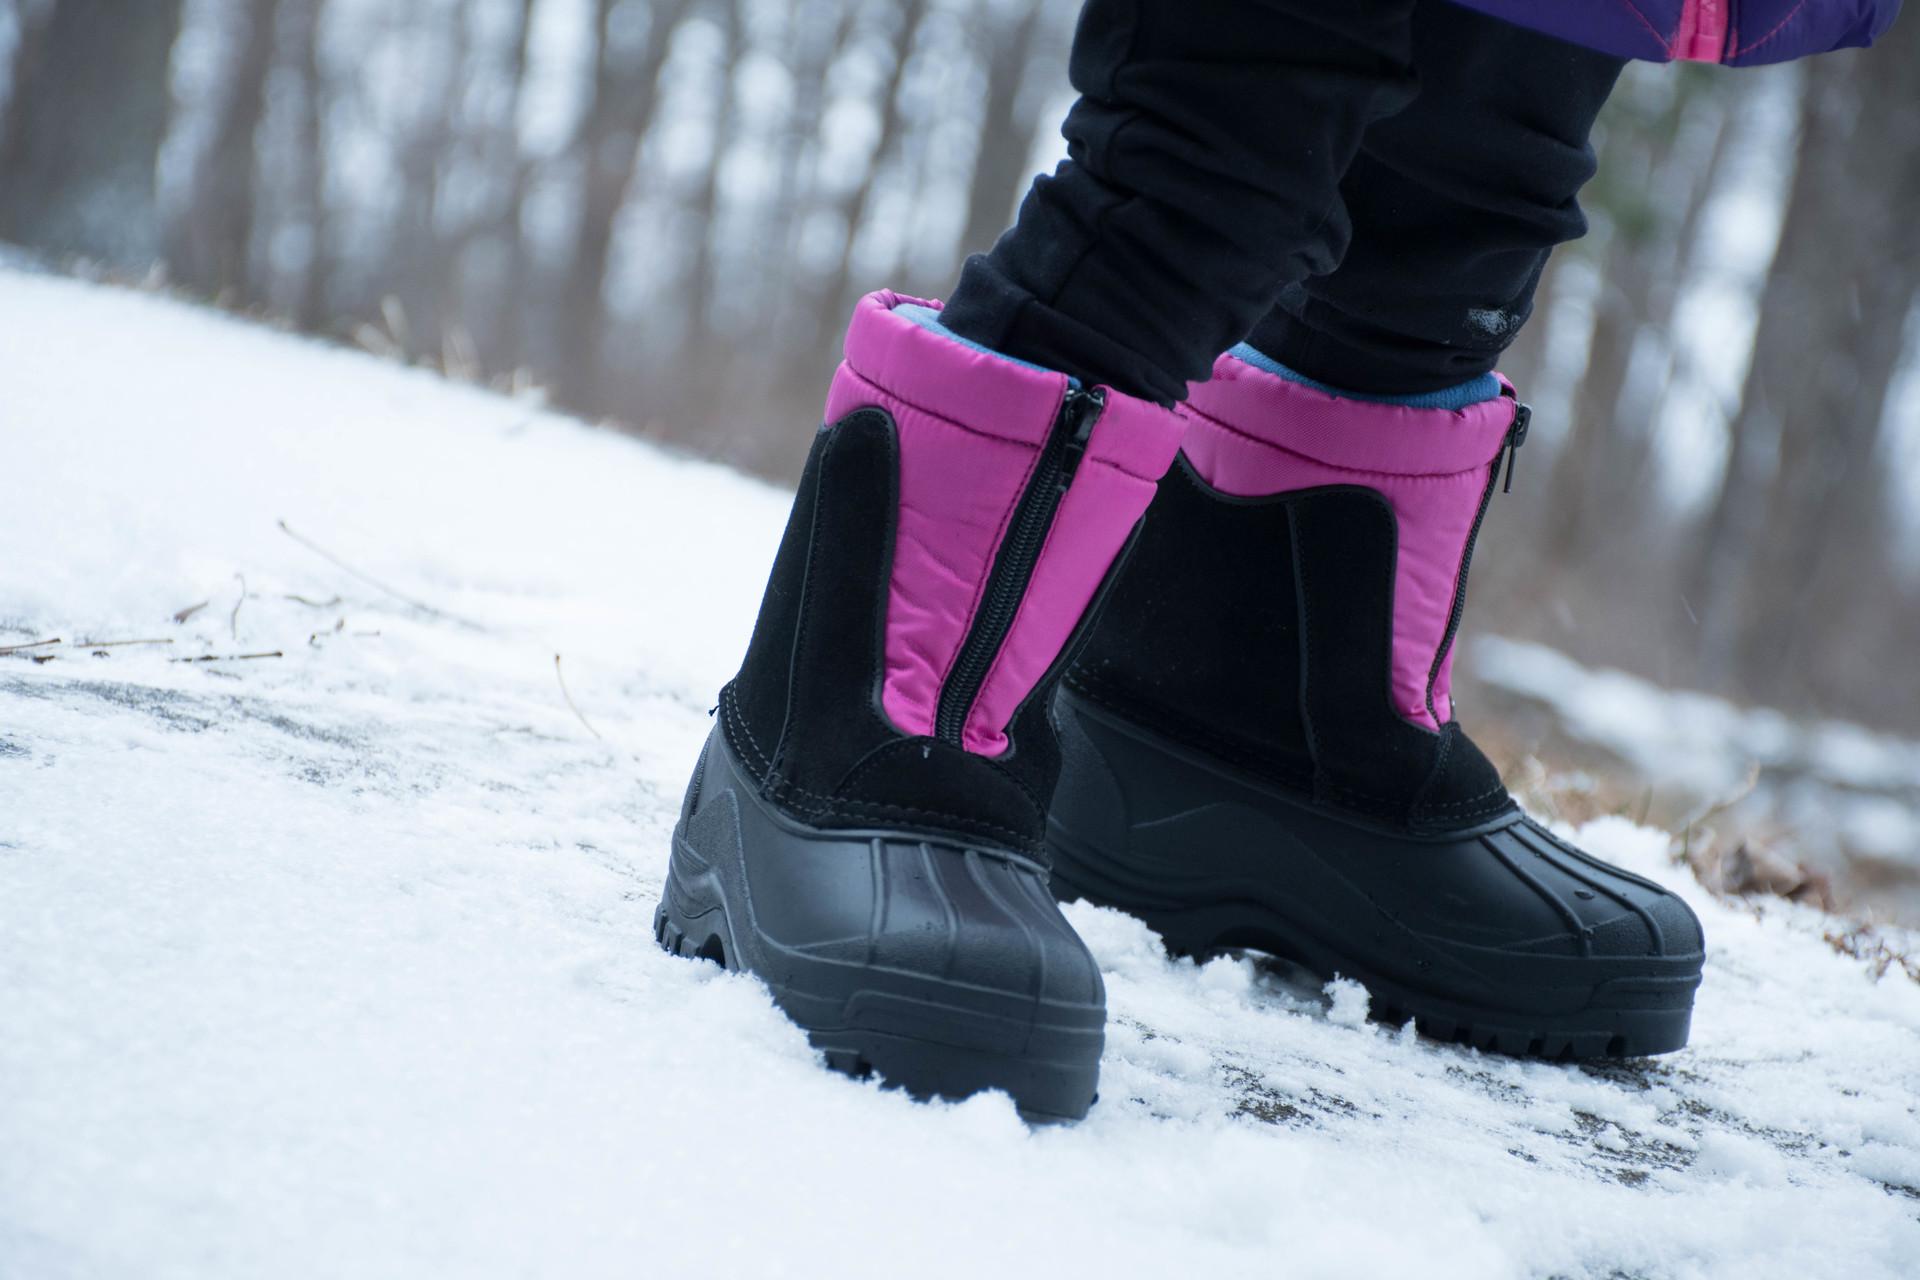 Winter wonderland example photo